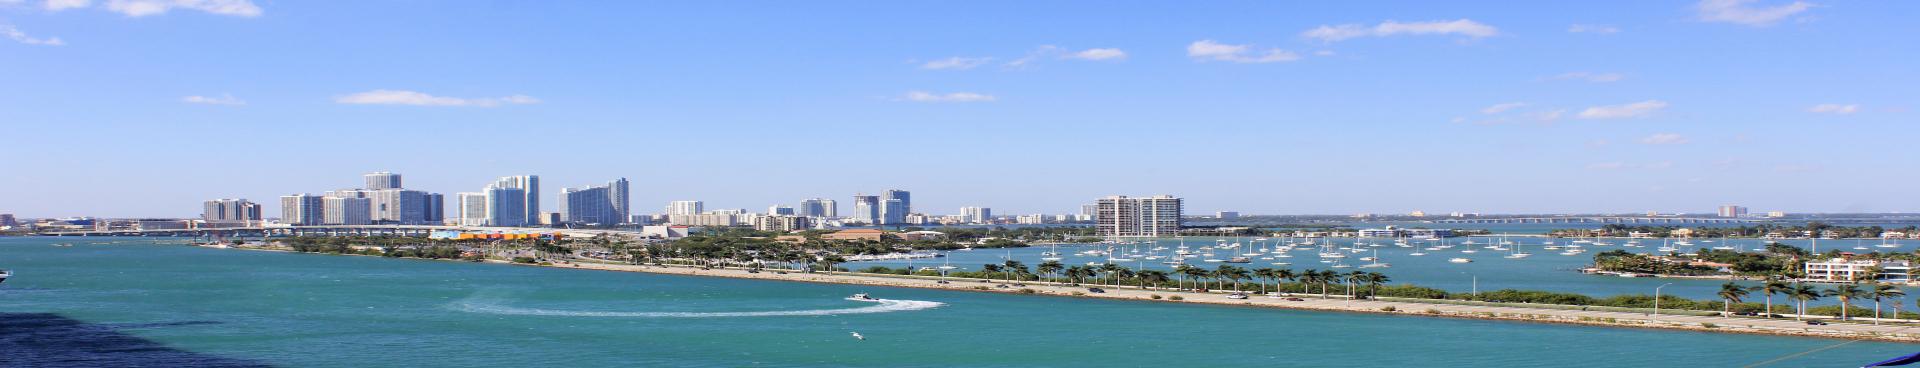 Florida panorama resized